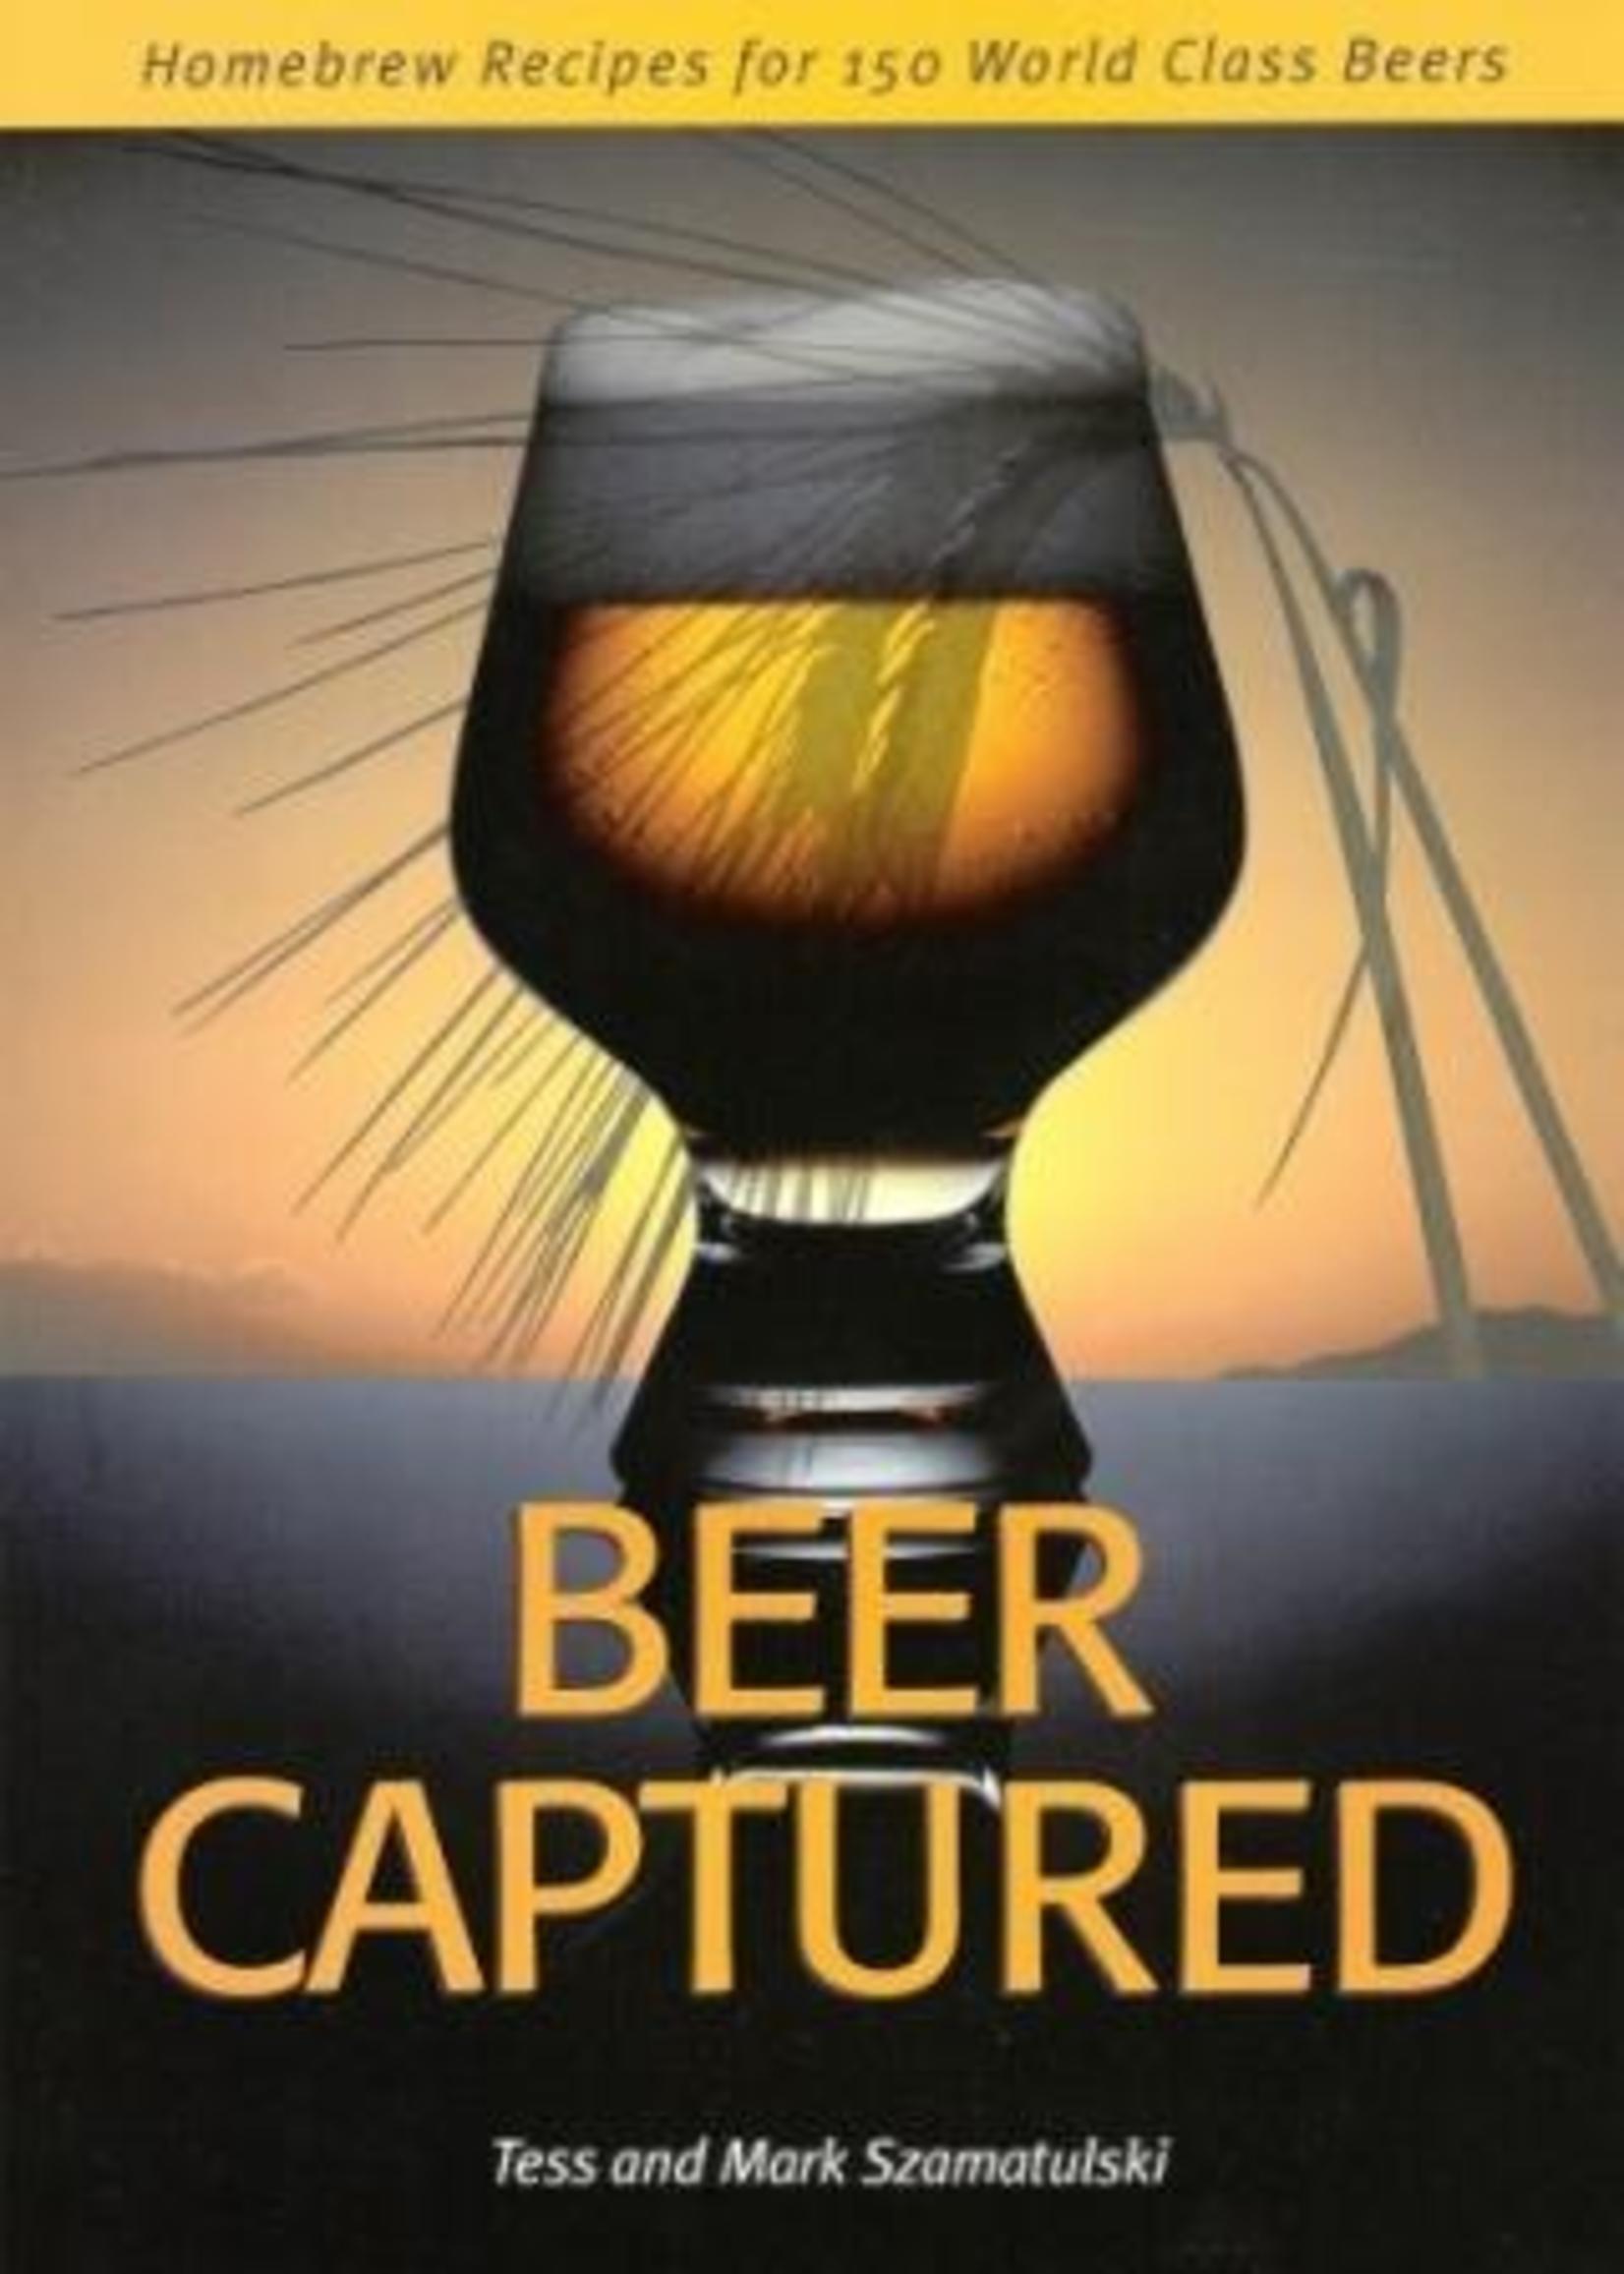 Books Beer Captured (Tess and Mark Szamatulski)